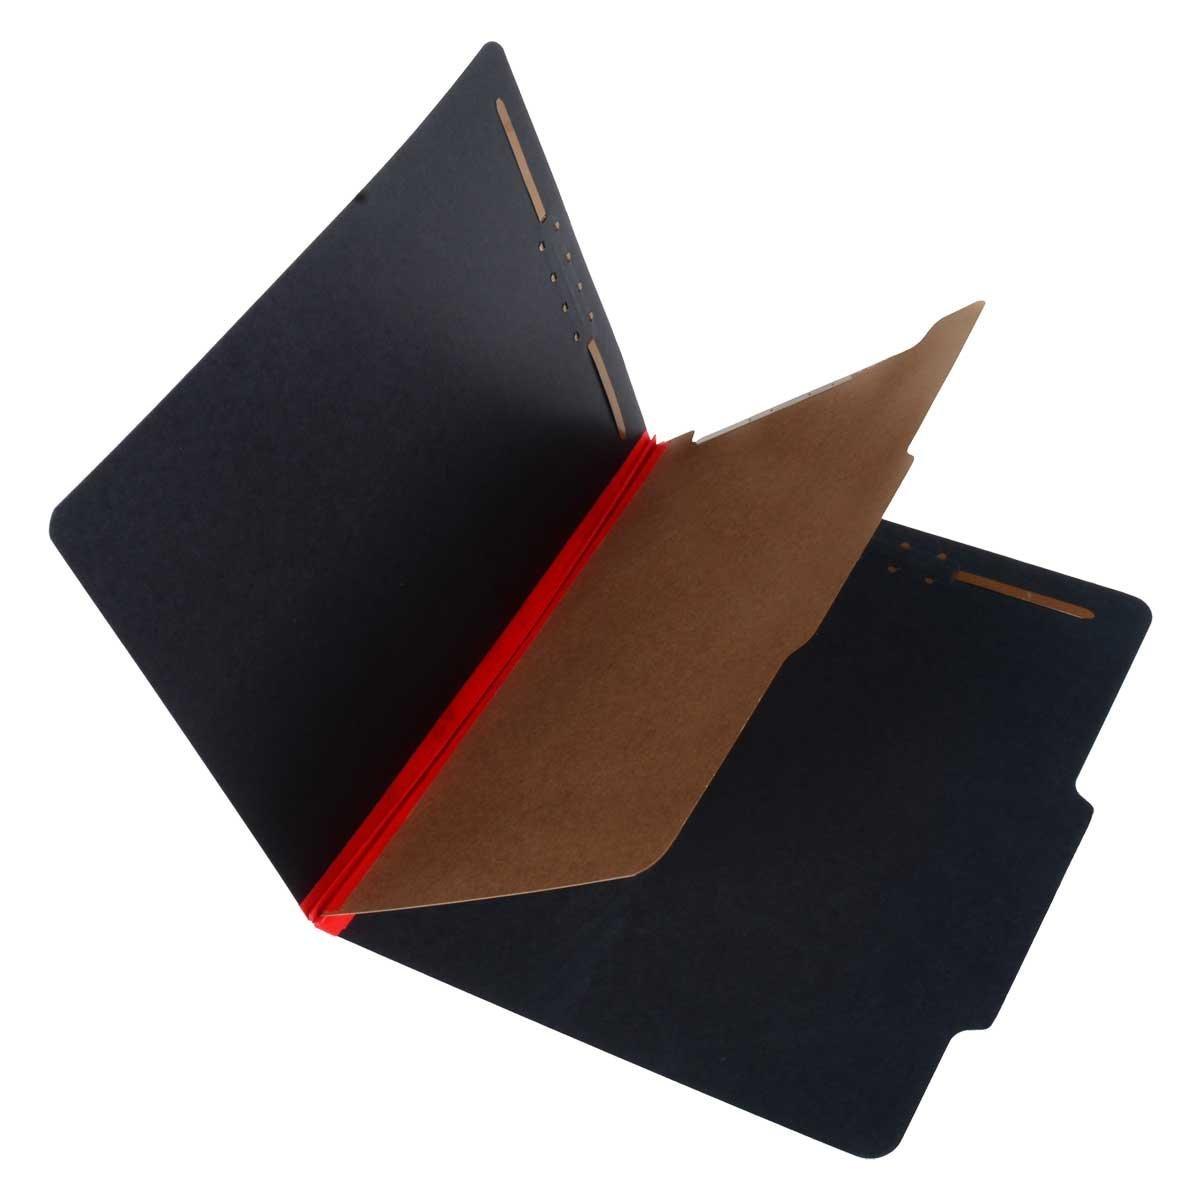 SJ Paper S62611 Match 25 Pt. Fusion Black Pressboard Classification Folders, 2/5 Cut ROC Top Tab, Letter Size, 1 Divider, Red tyvek (Box of 20)